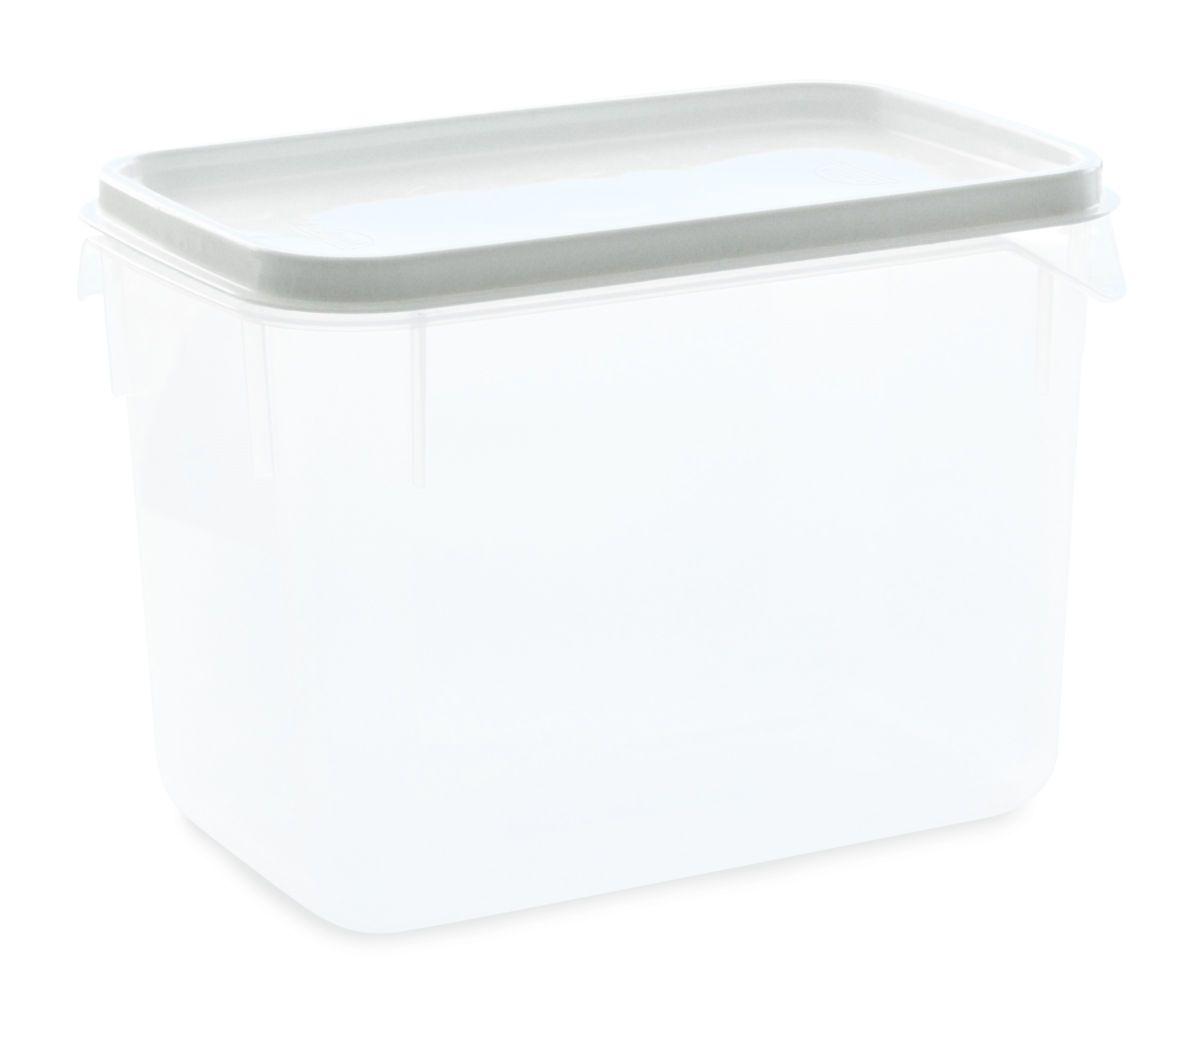 Pote 2,9 L Plástico Moduline